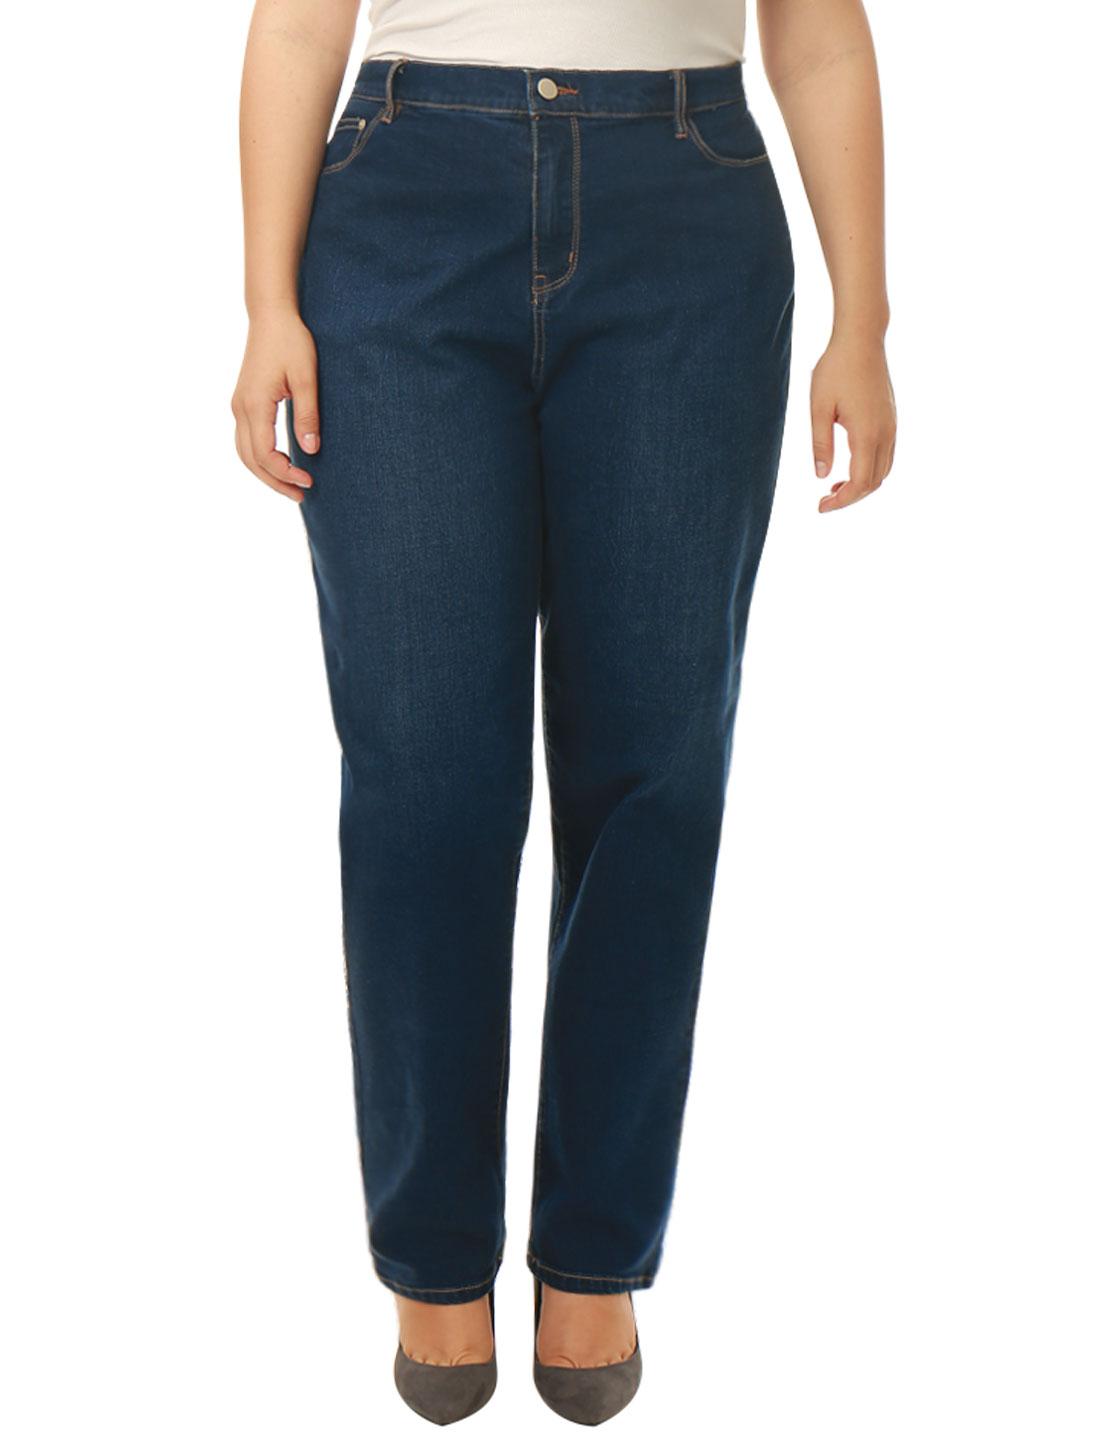 Women Plus Size Mid Rise Stretch Straight Leg Jeans Blue 2X